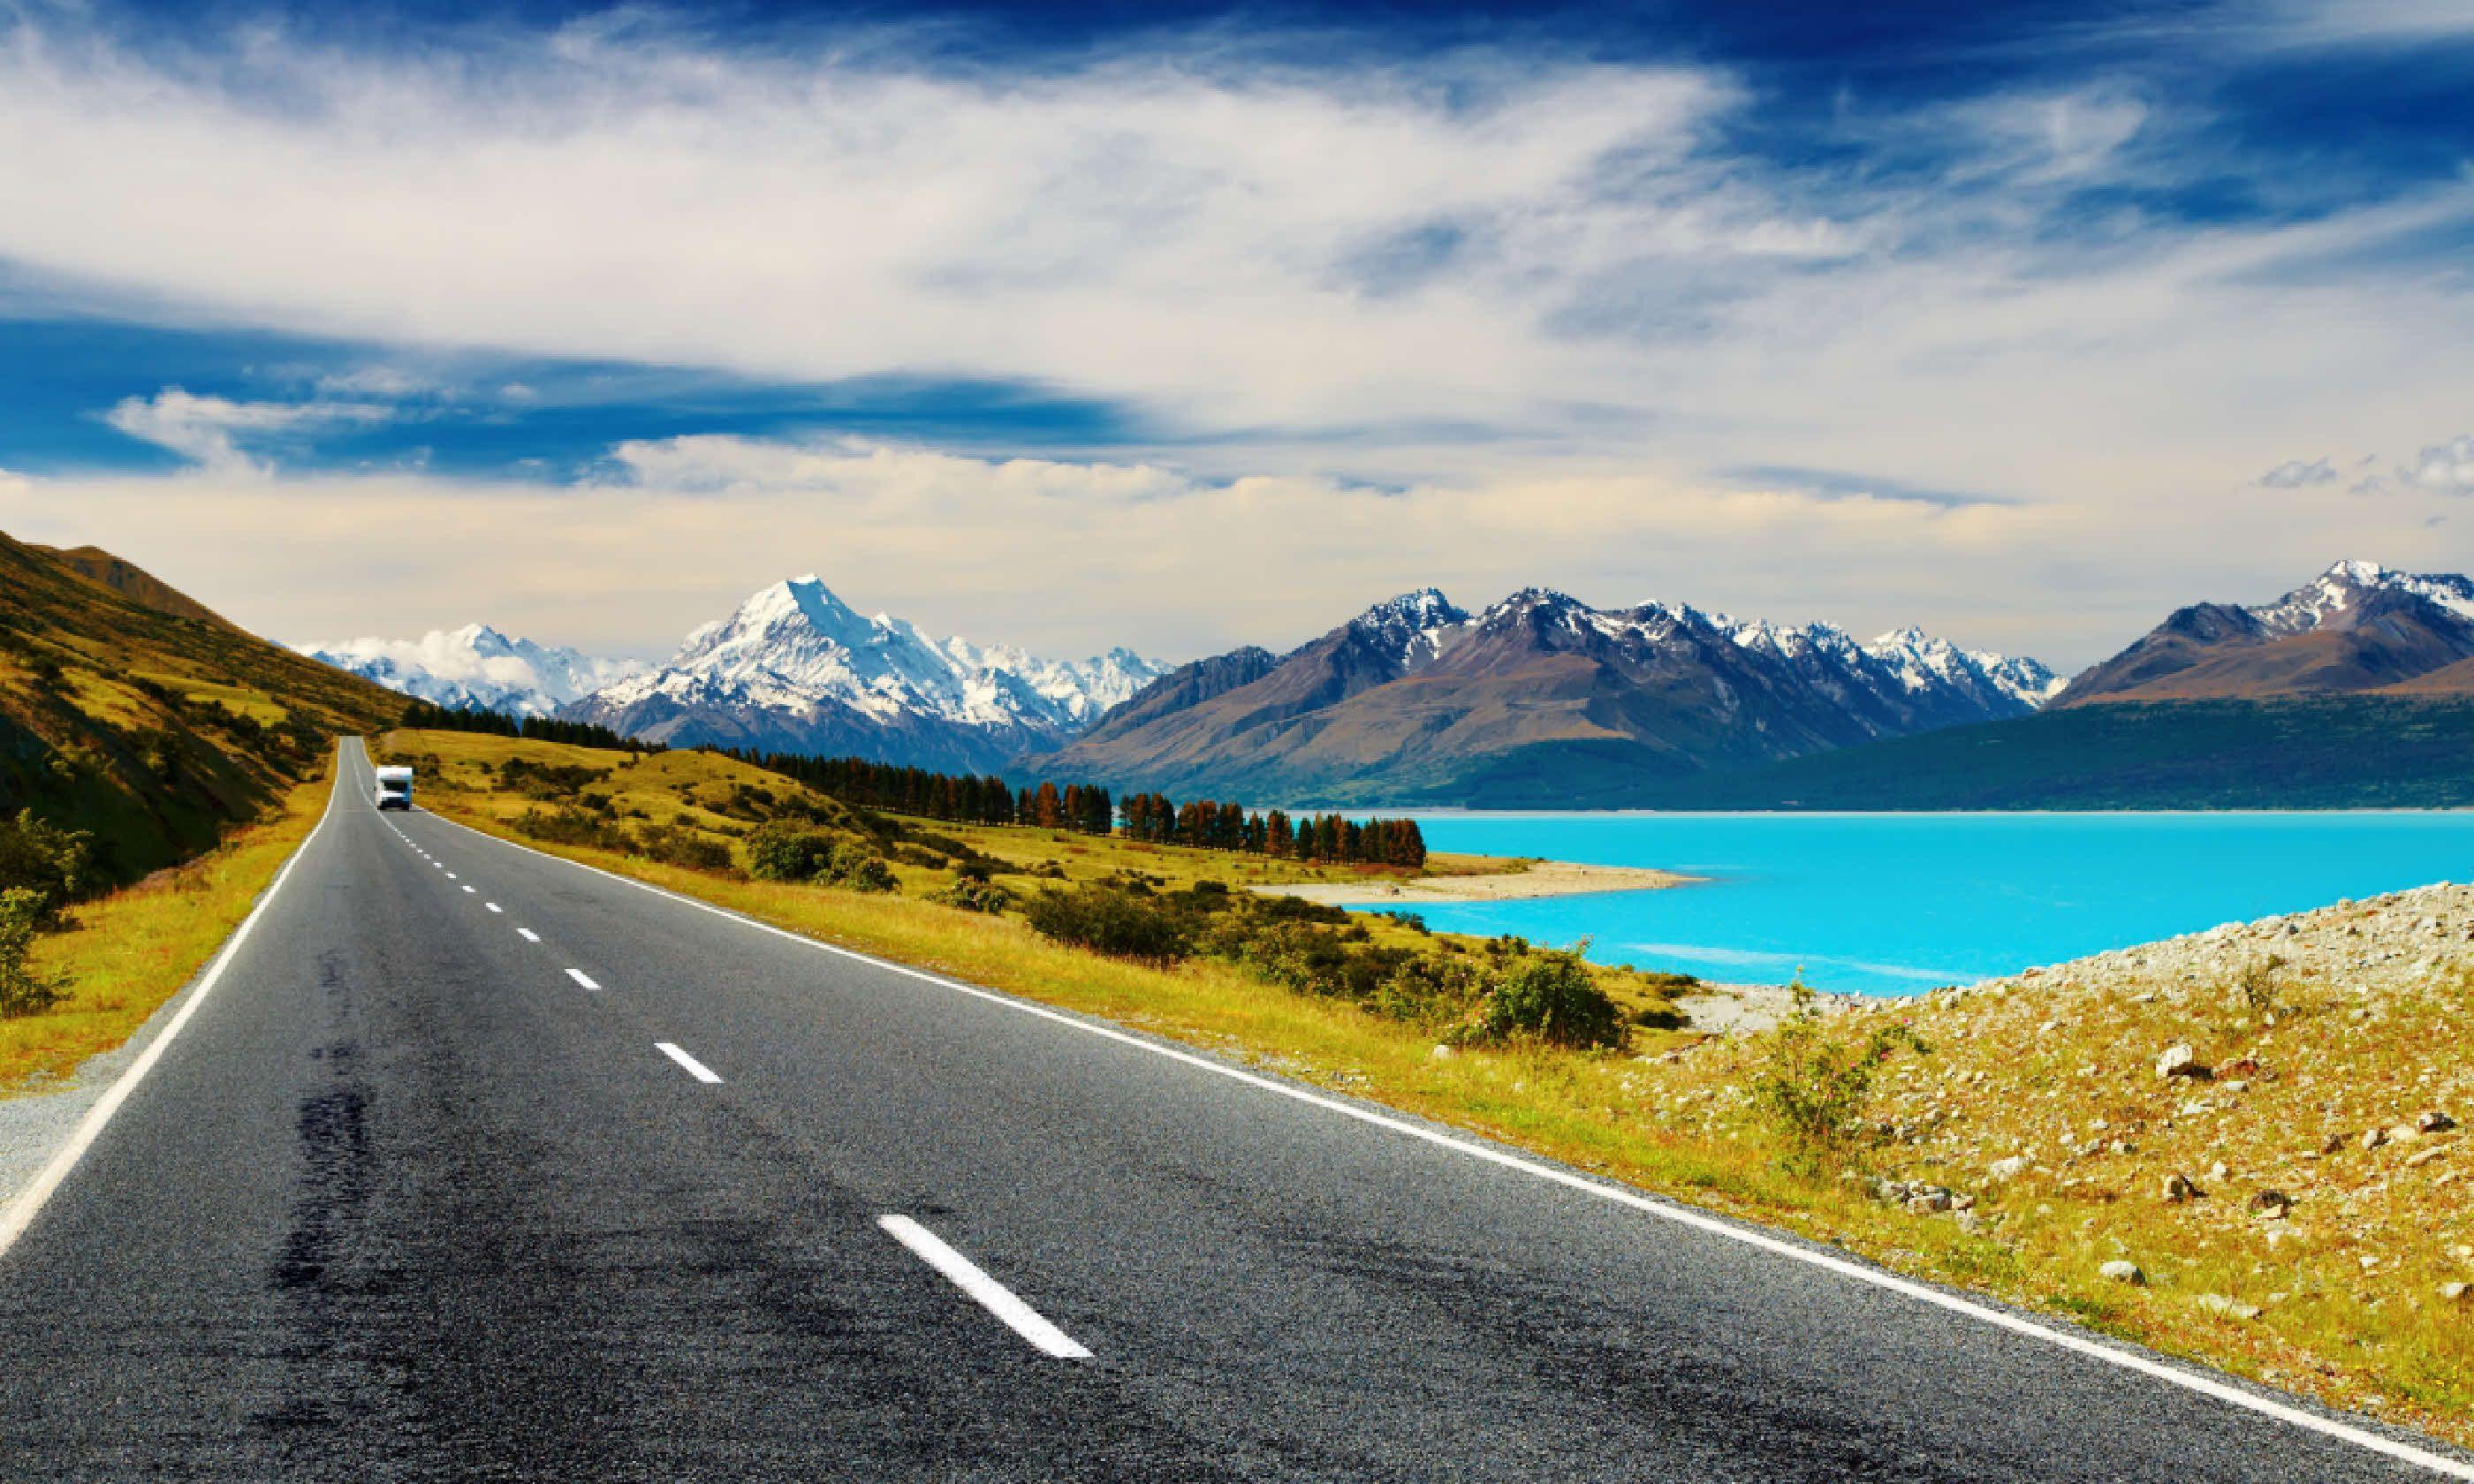 Mount Cook and Pukaki lake, New Zealand (Shutterstock)